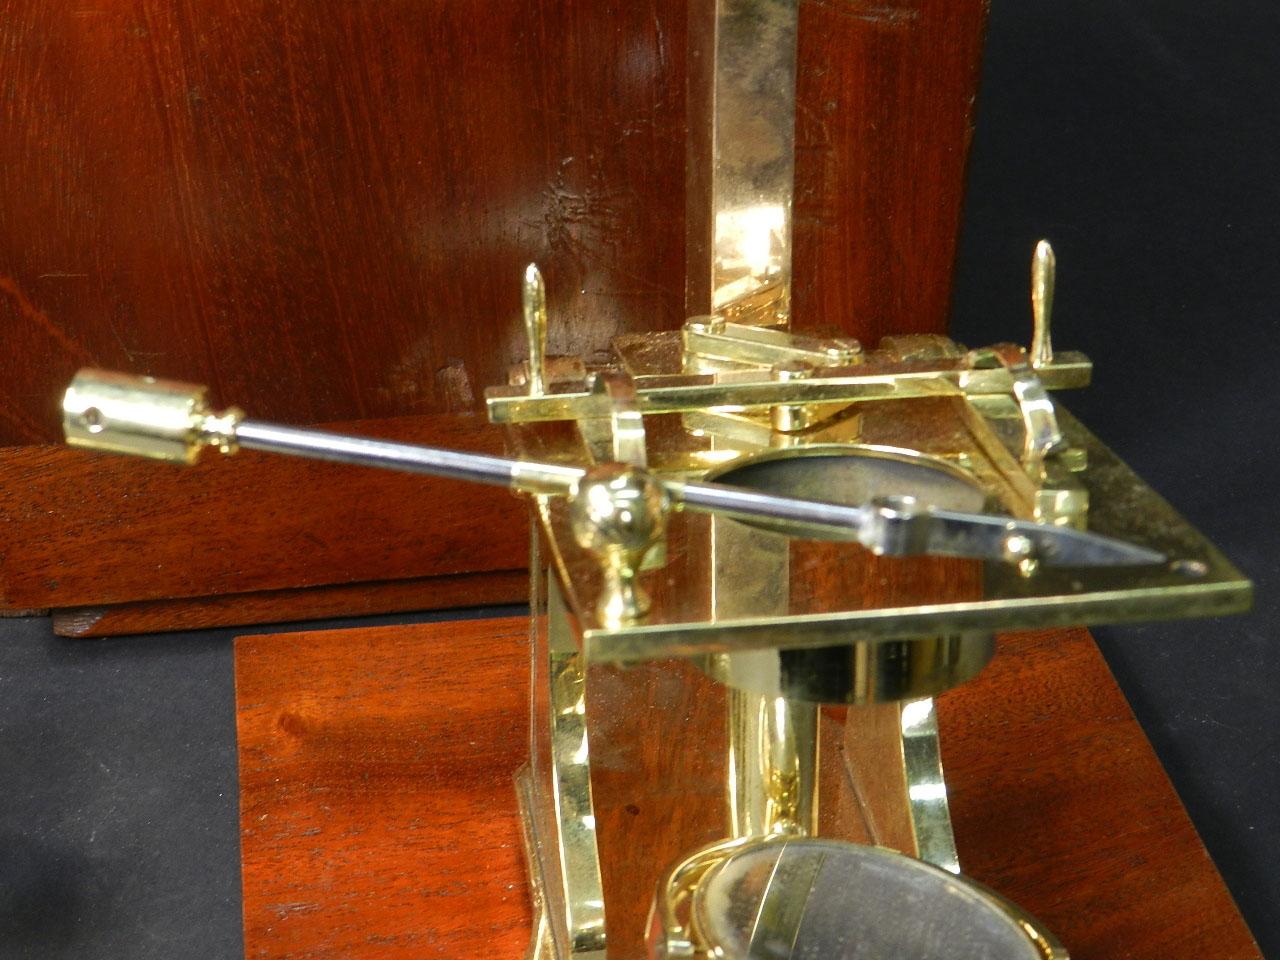 Imagen MICROSCOPIO BINOCULAR H.W. CROUCH AÑO 1862 24900